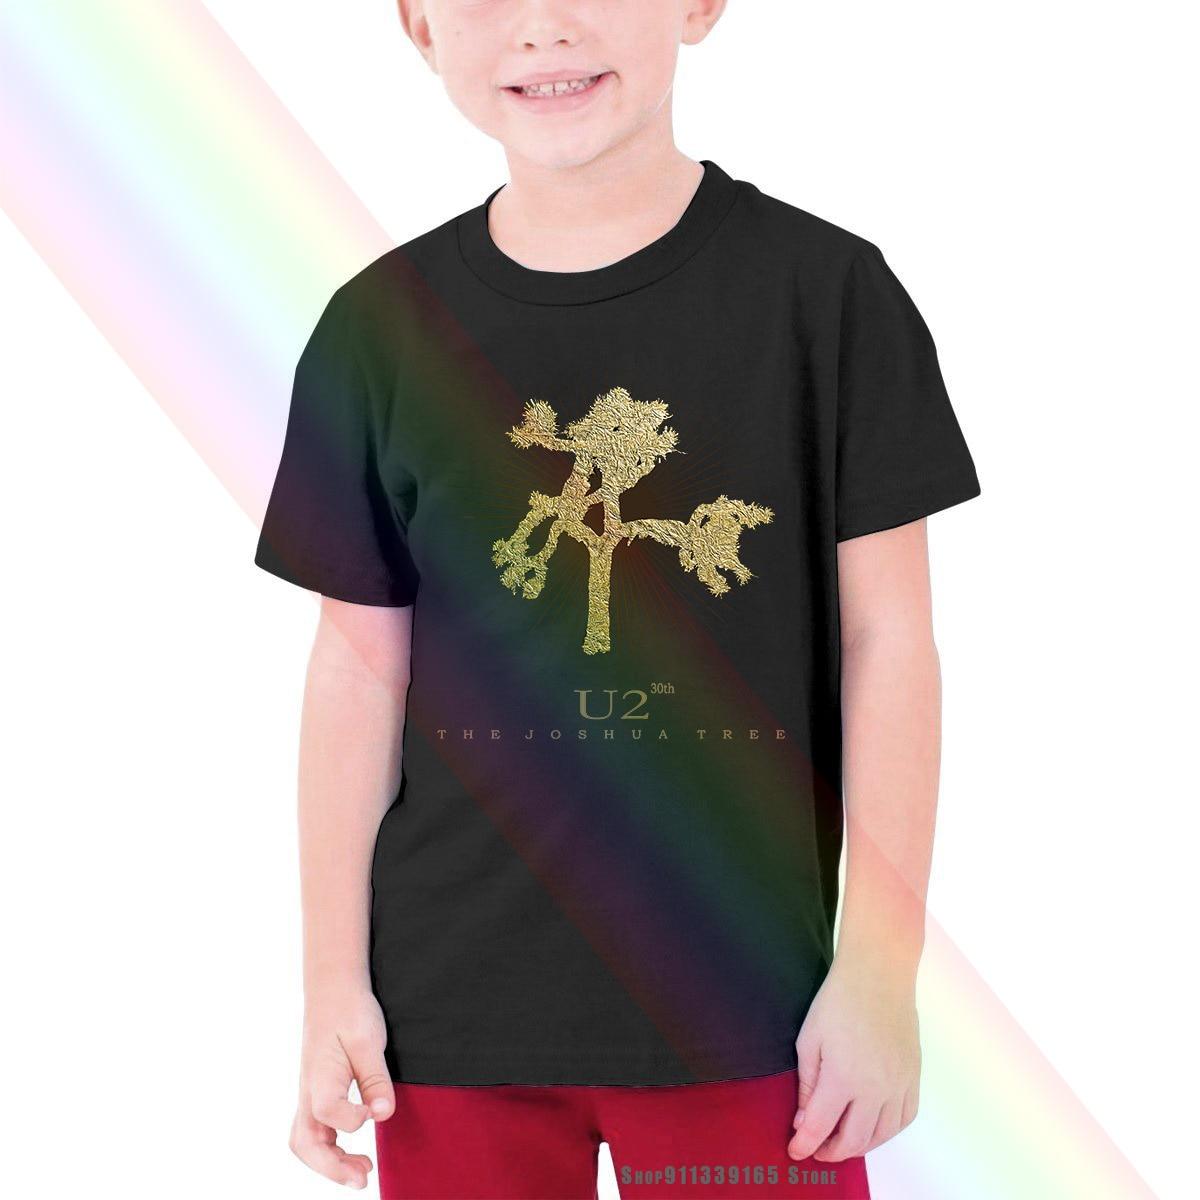 U2 Детская футболка с изображением дерева шушушуа на 30-летие юбилея, Мужская детская футболка